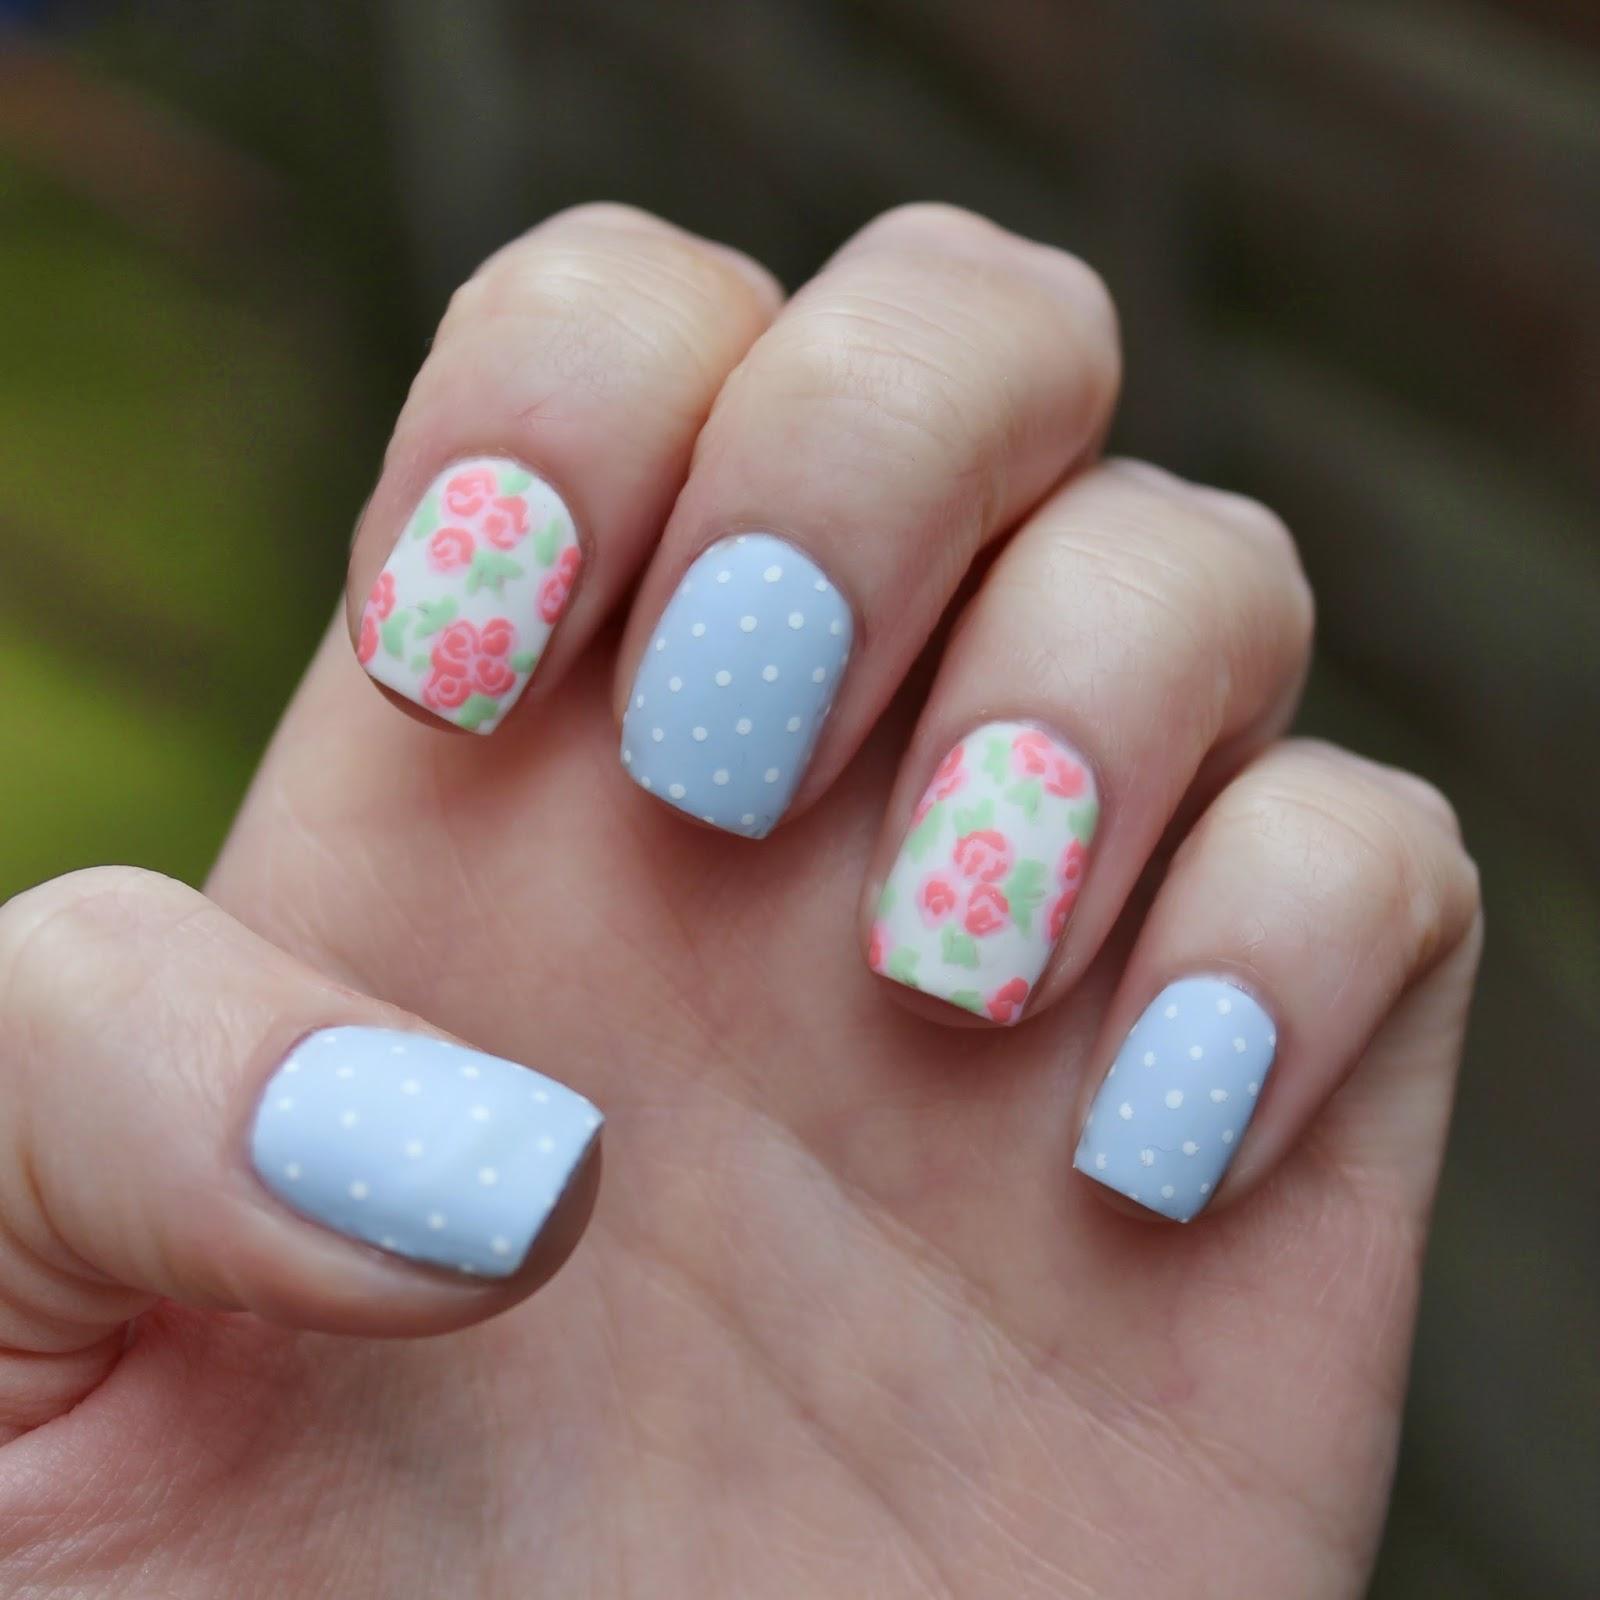 Dahlia Nails: February 2015